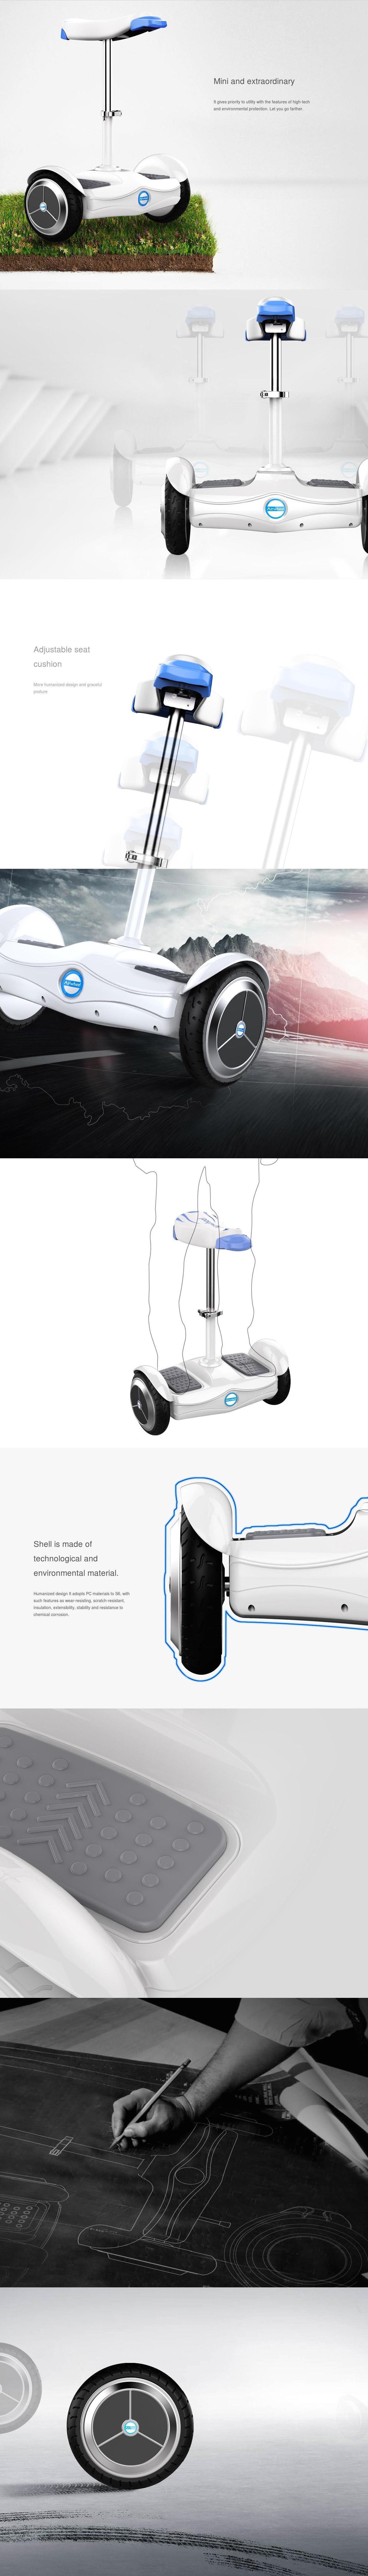 Black friday cyber monday airwheel s6 motorized seated for Motorized scooter black friday